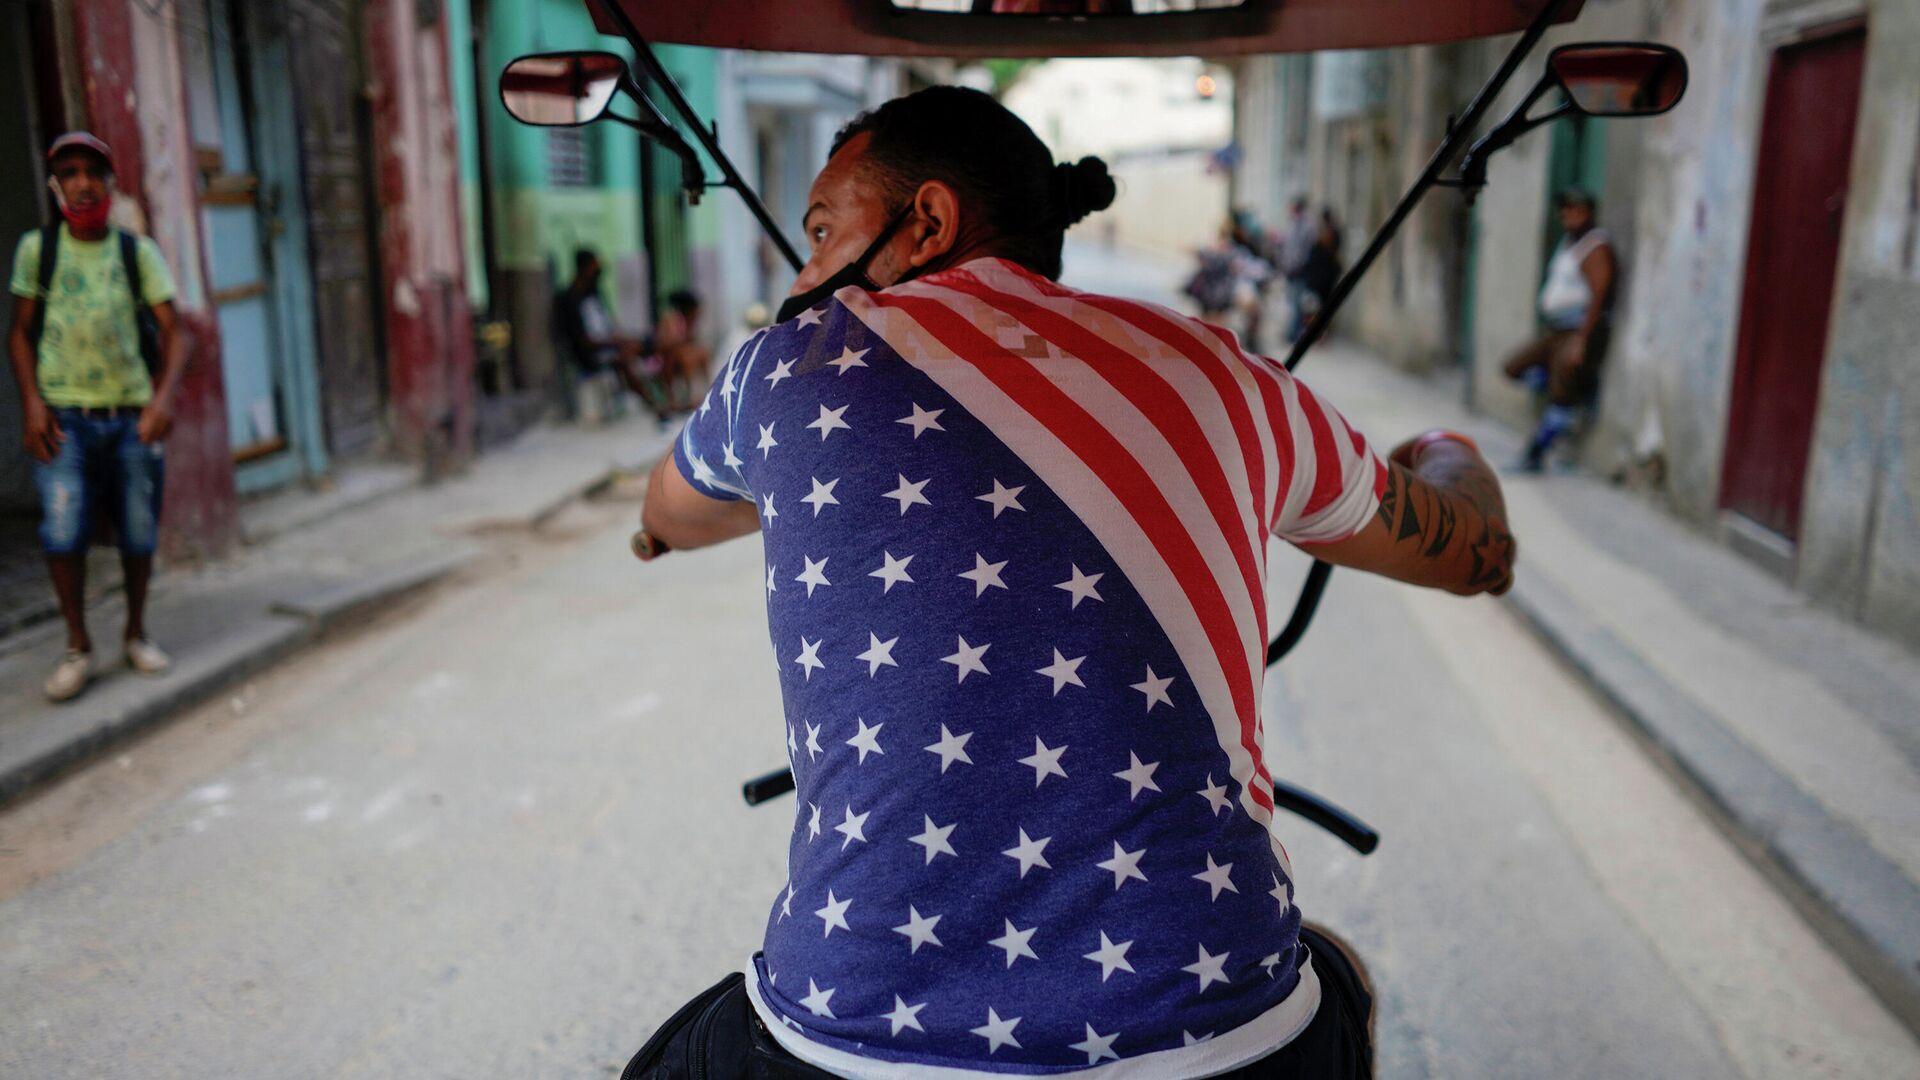 Un chico en bicicleta en la Habana, Cuba  - Sputnik Mundo, 1920, 26.03.2021